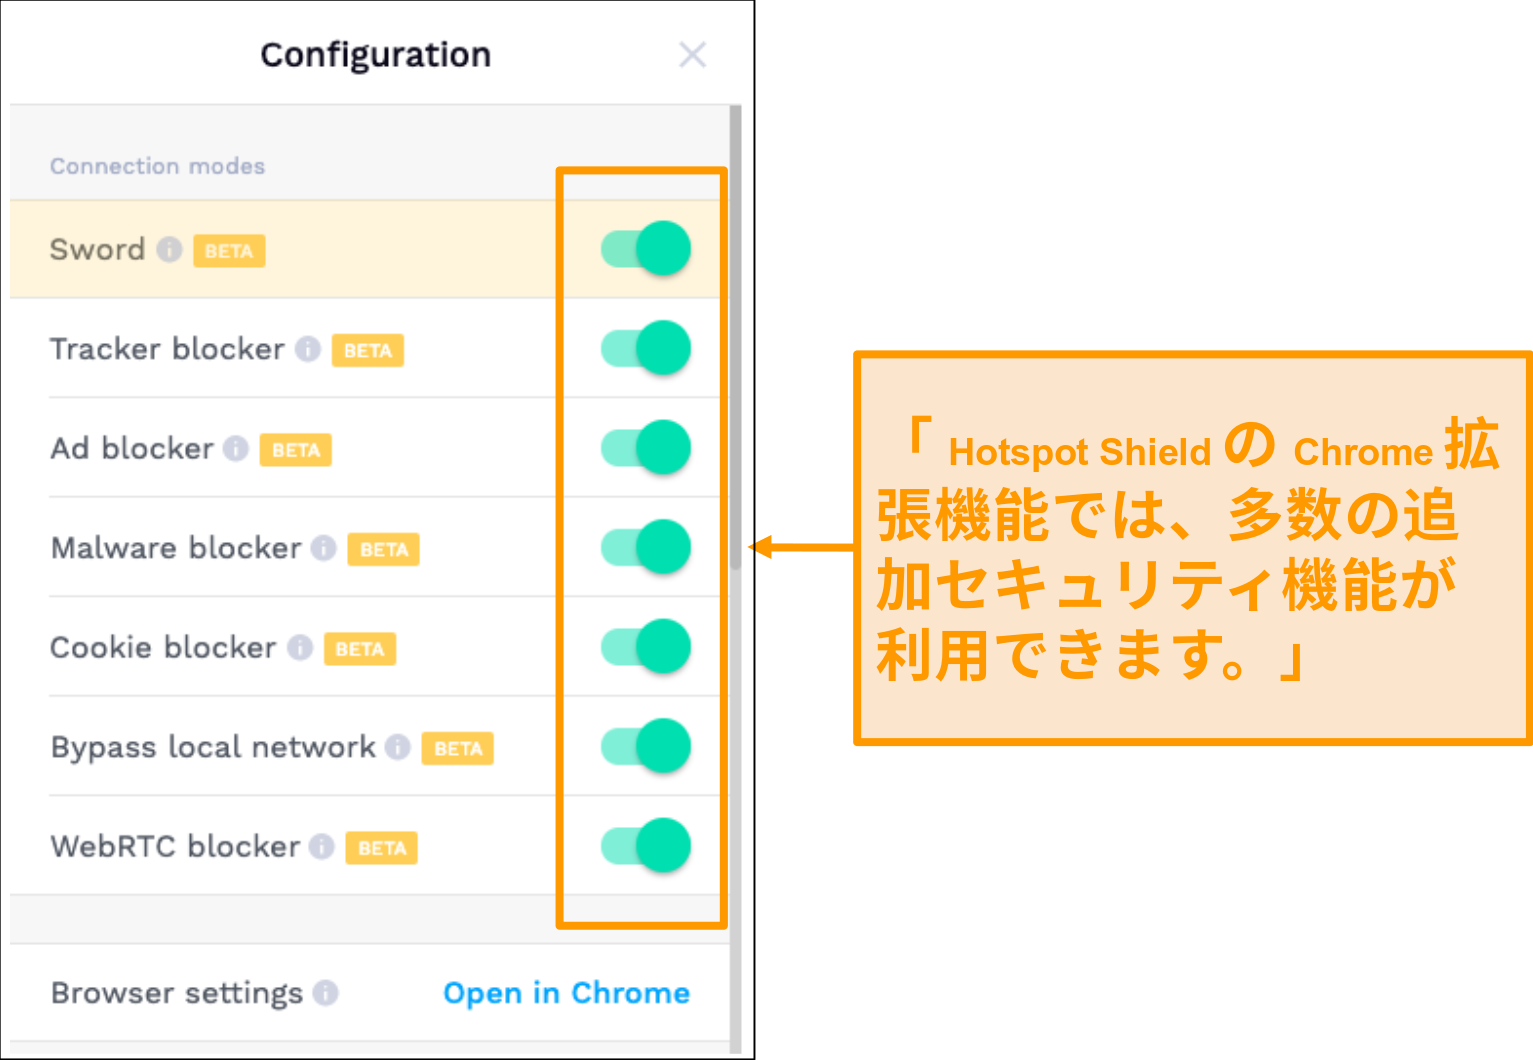 HotSpotShieldのChrome拡張機能のセキュリティ機能のスクリーンショット。